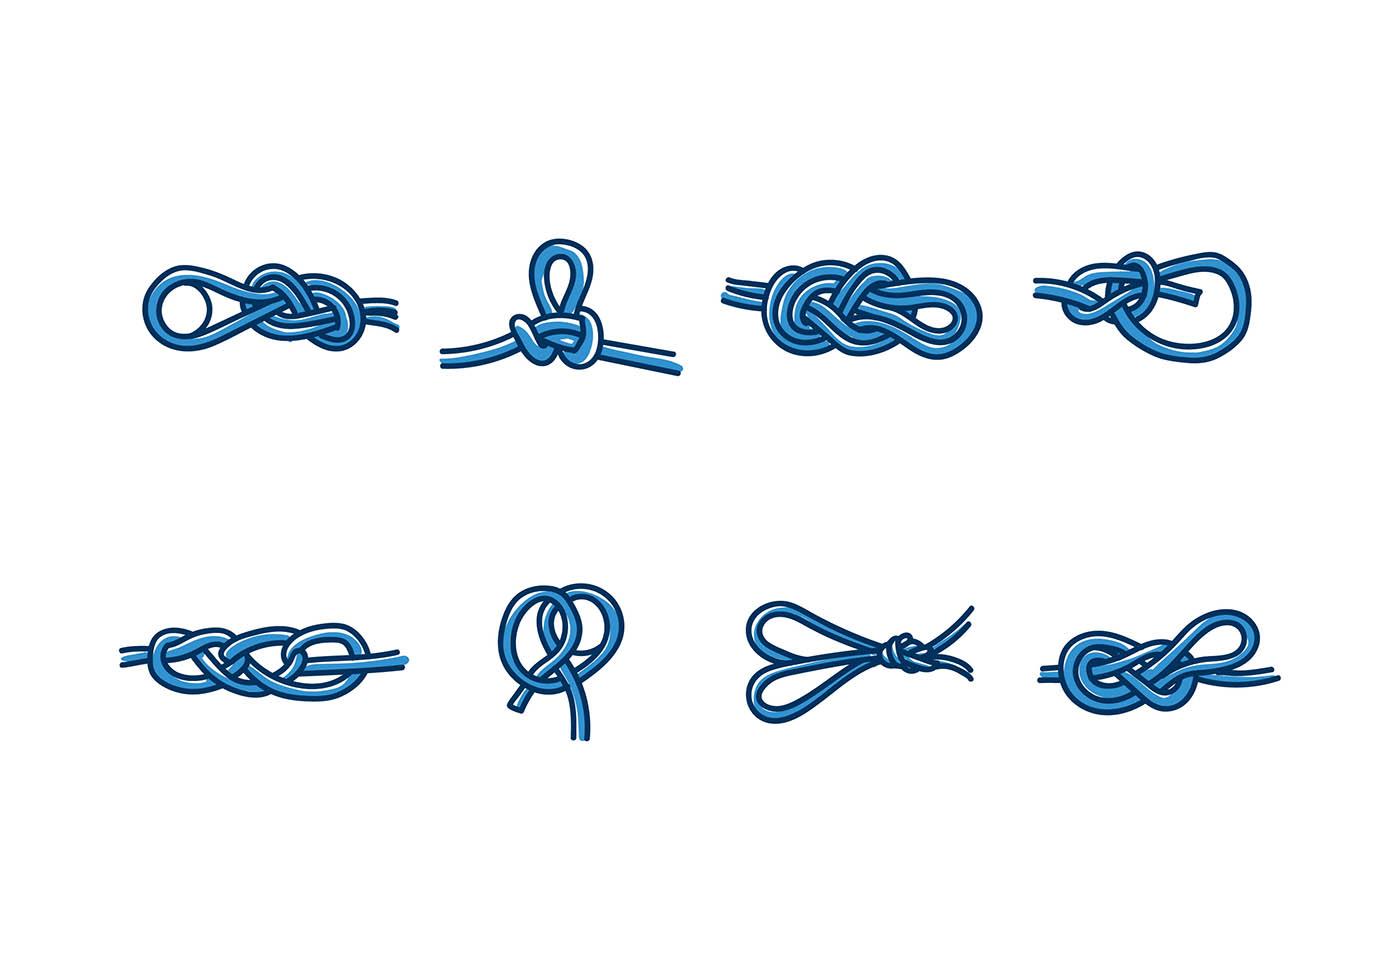 1400x980 Knot Free Vector Art